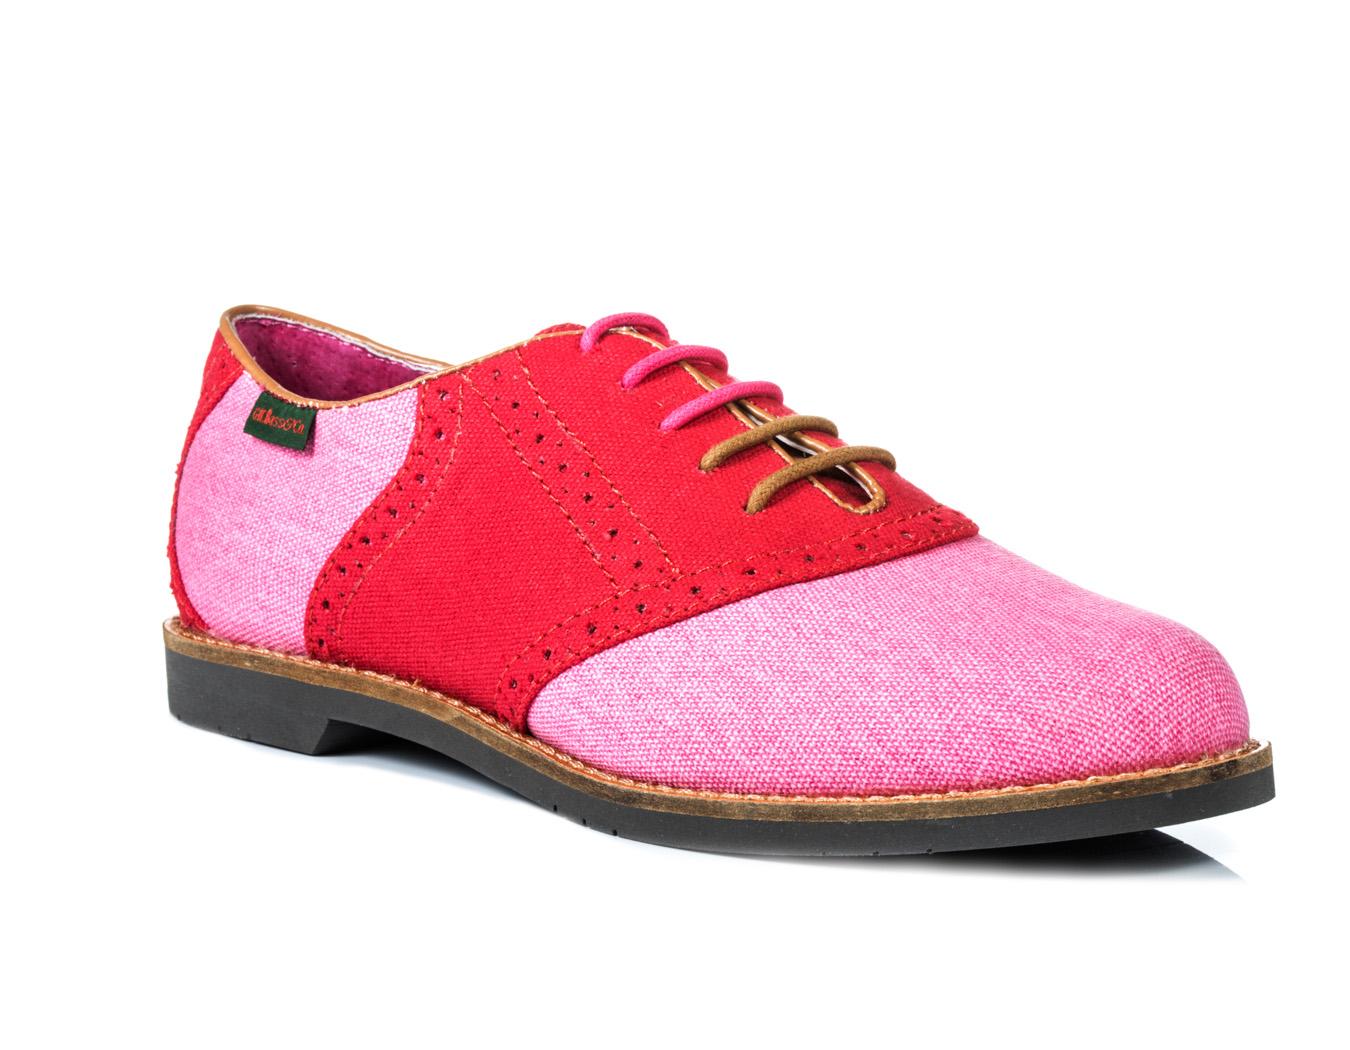 GH Bass Shoes